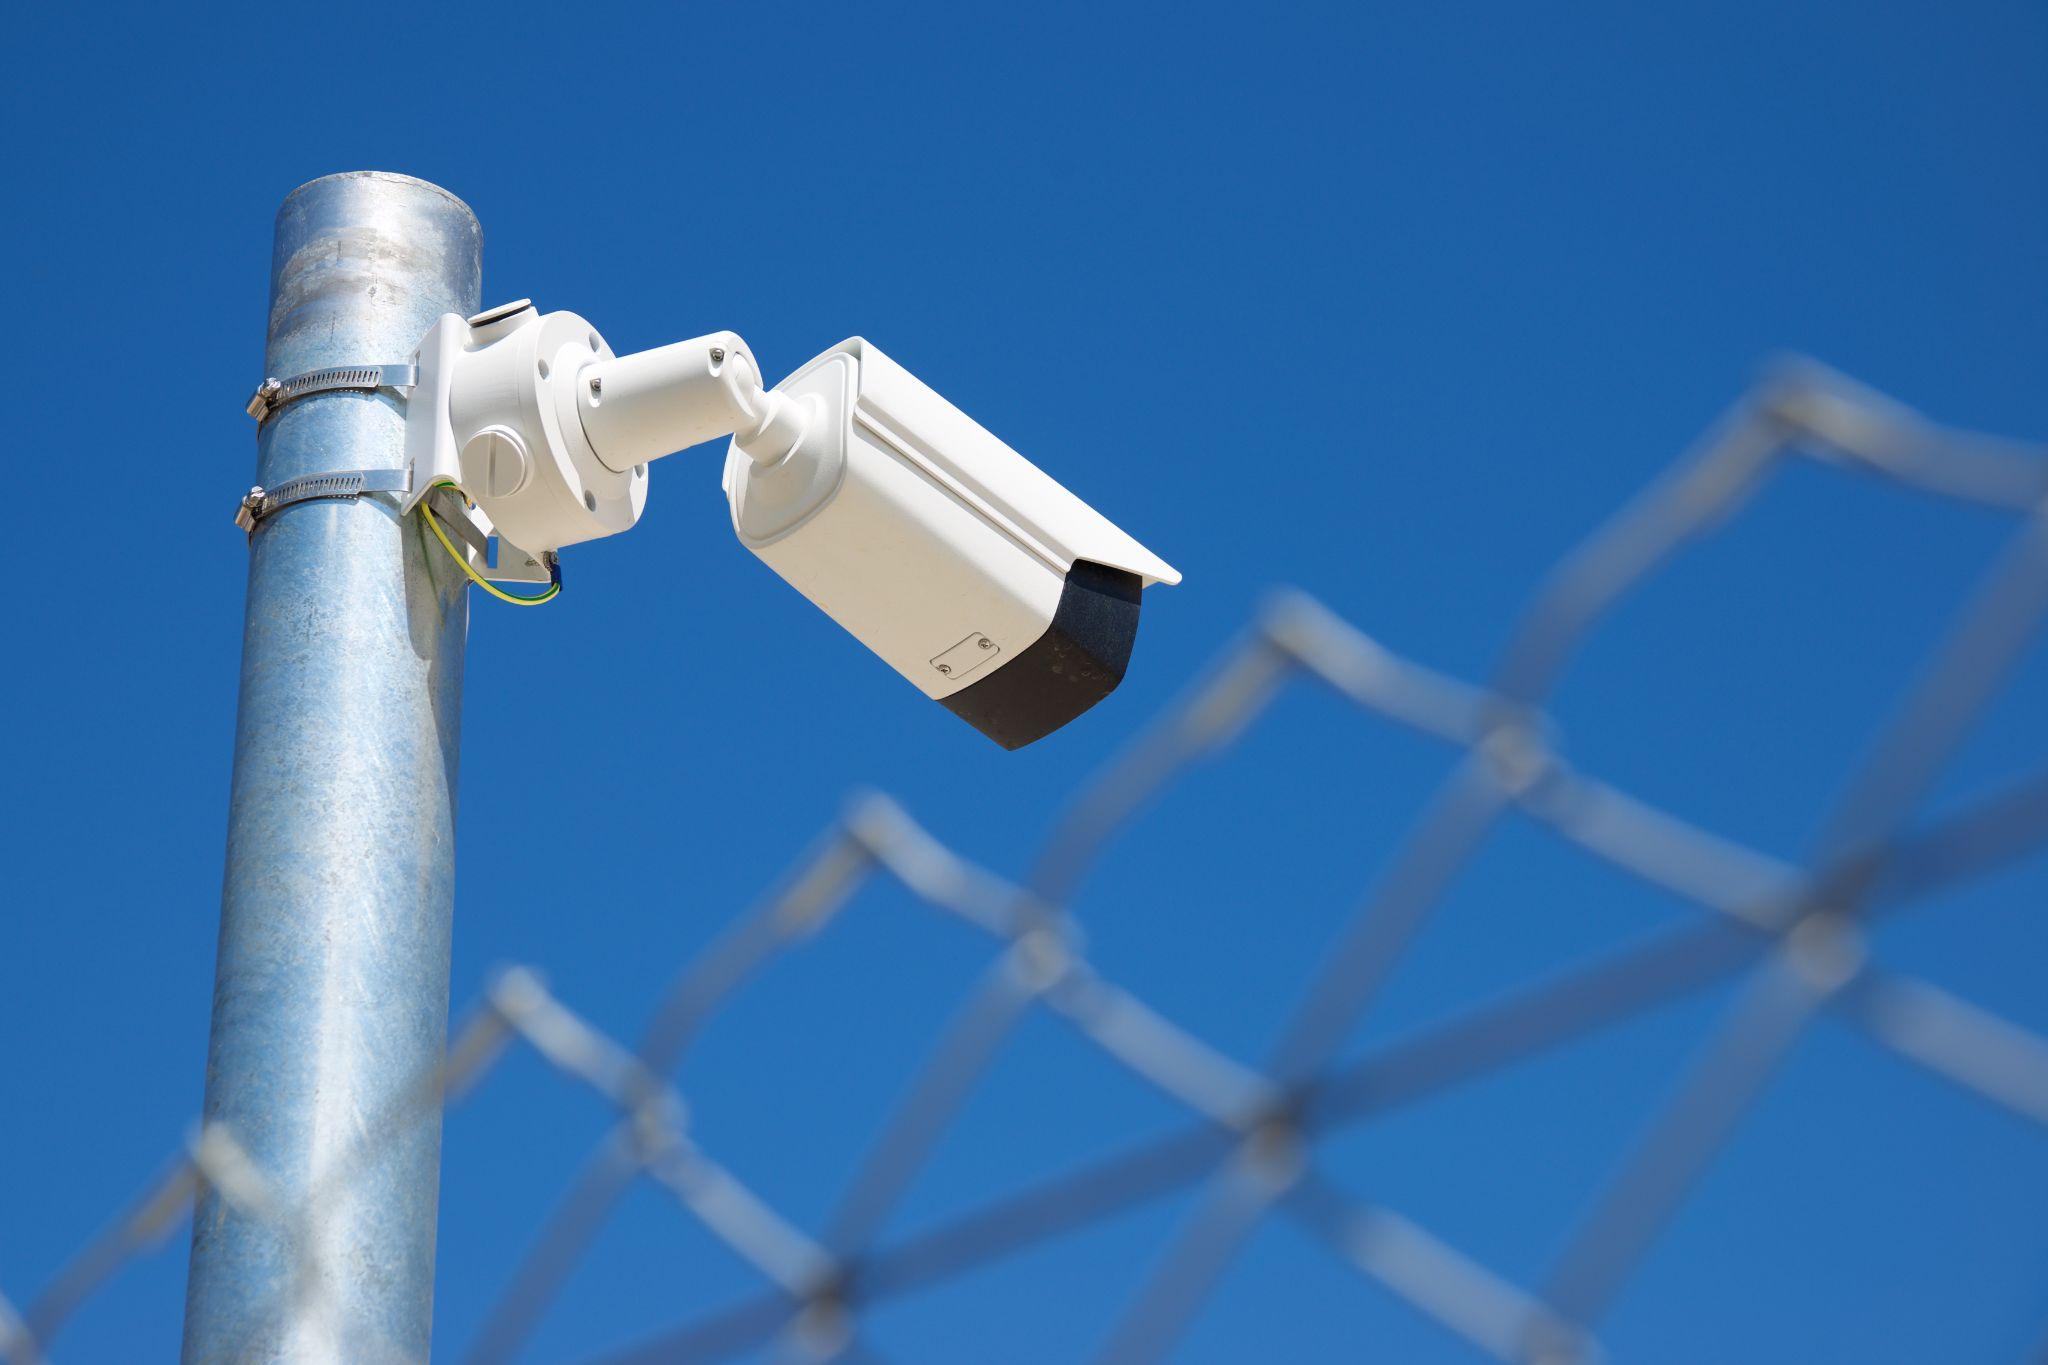 A surveillance camera along with temporary fencing